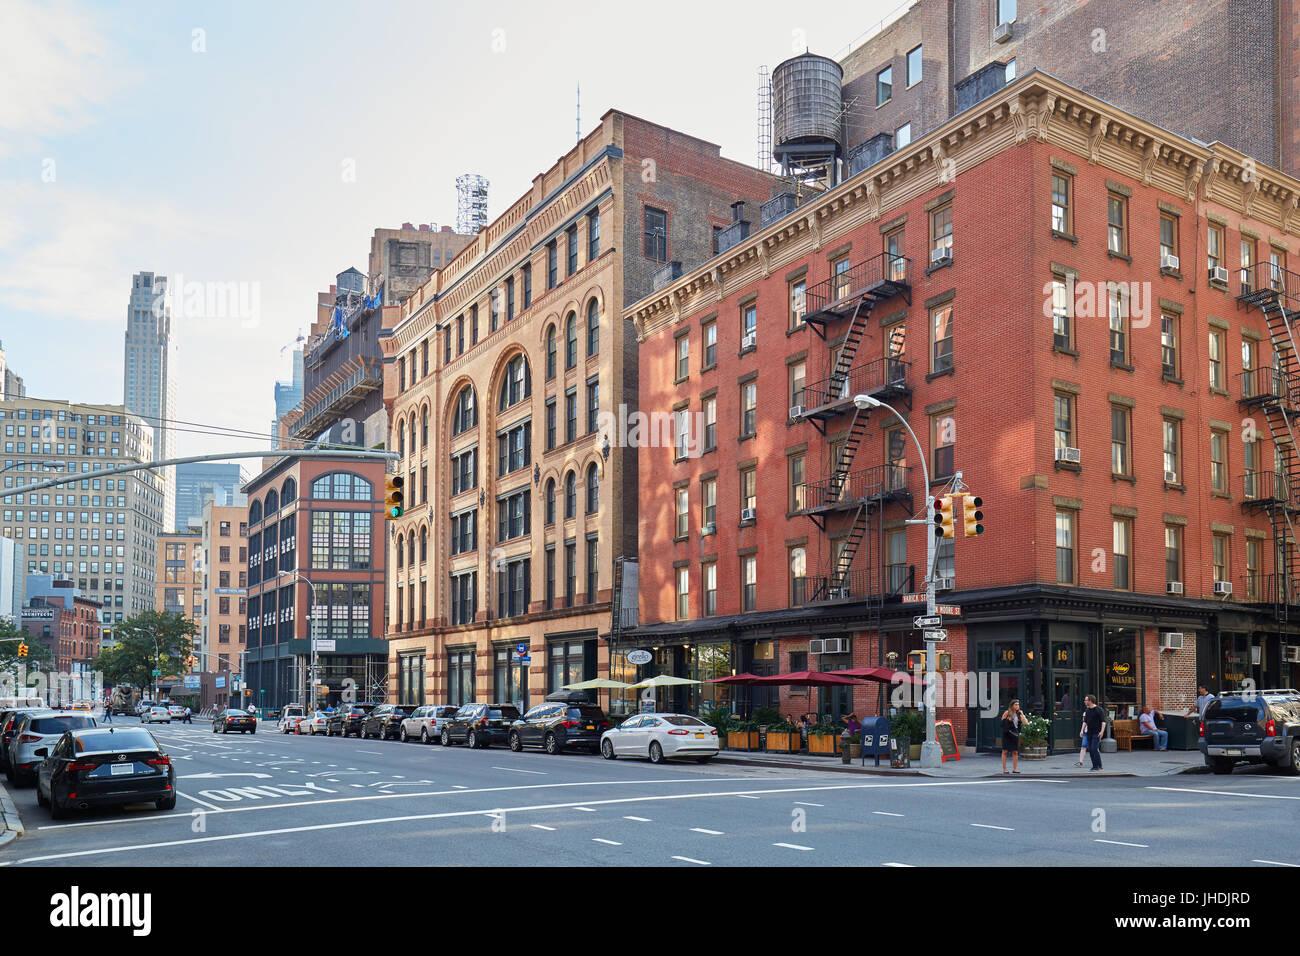 Tribeca Viertel leere Straßen an einem sonnigen Sommertag in New York Stockbild